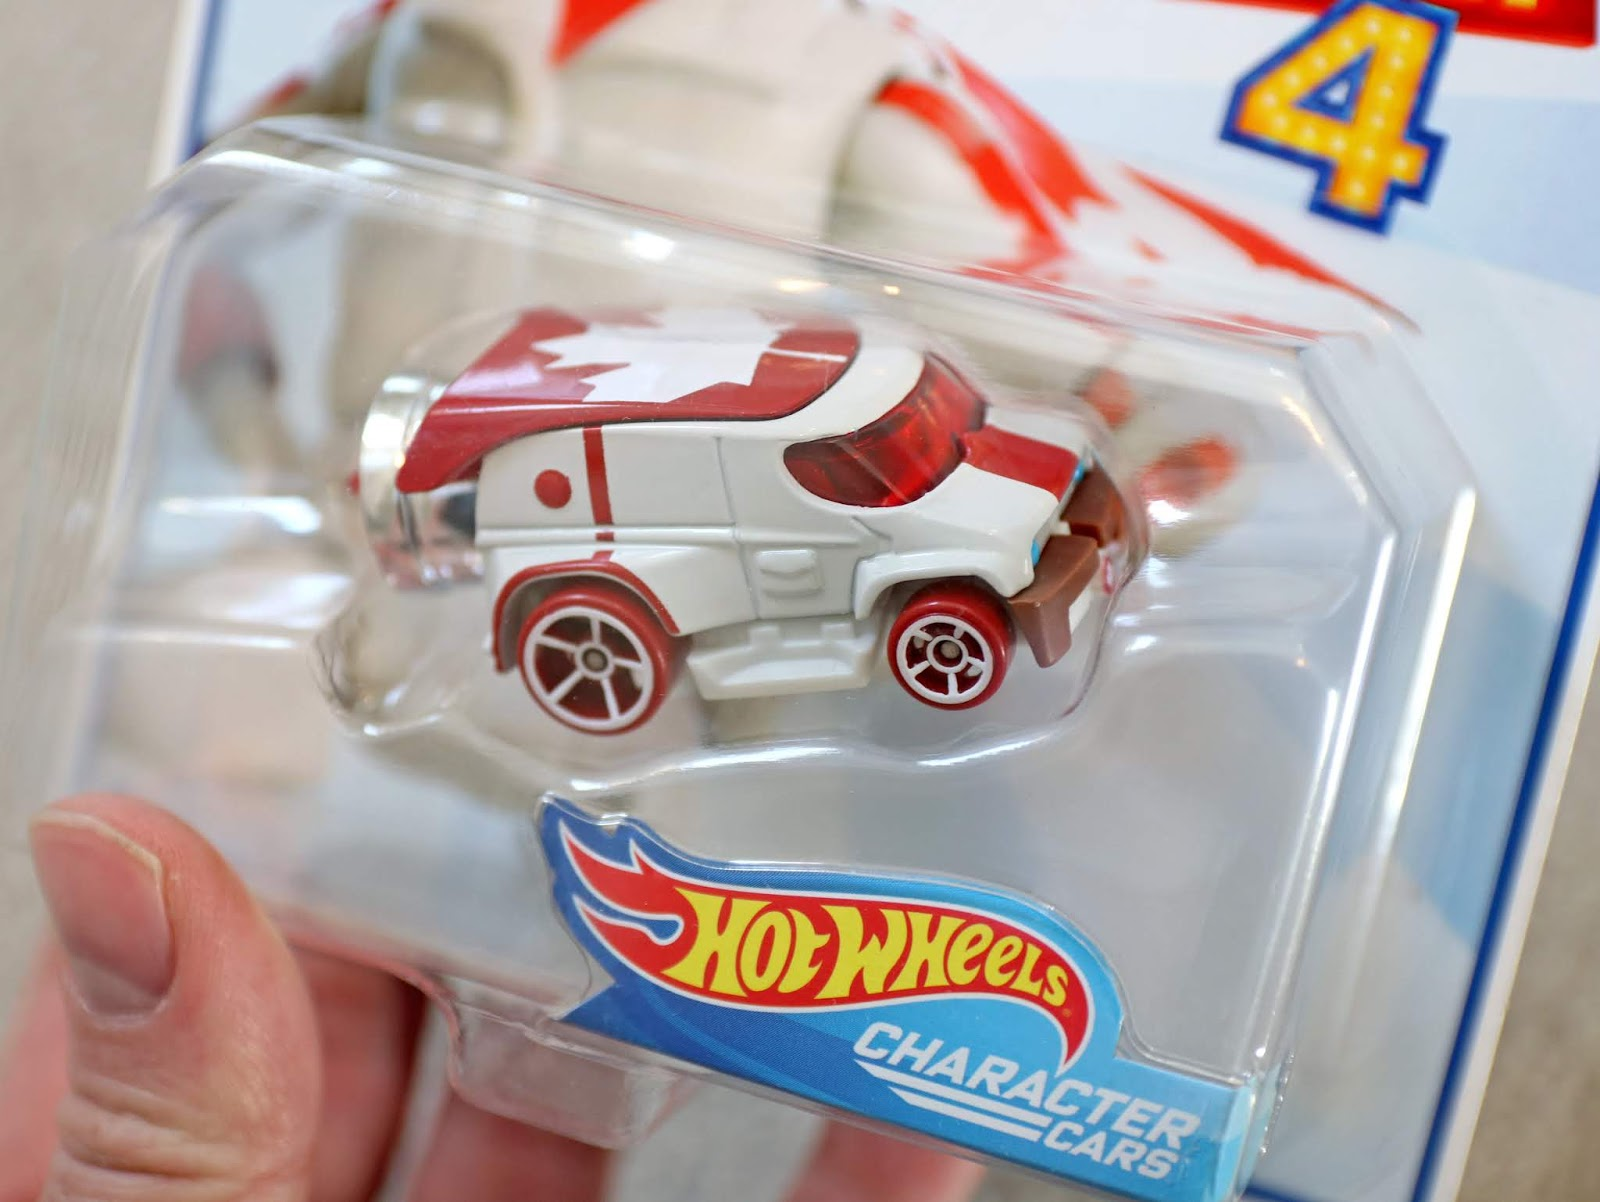 toy story 4 hotwheels character cars duke caboom